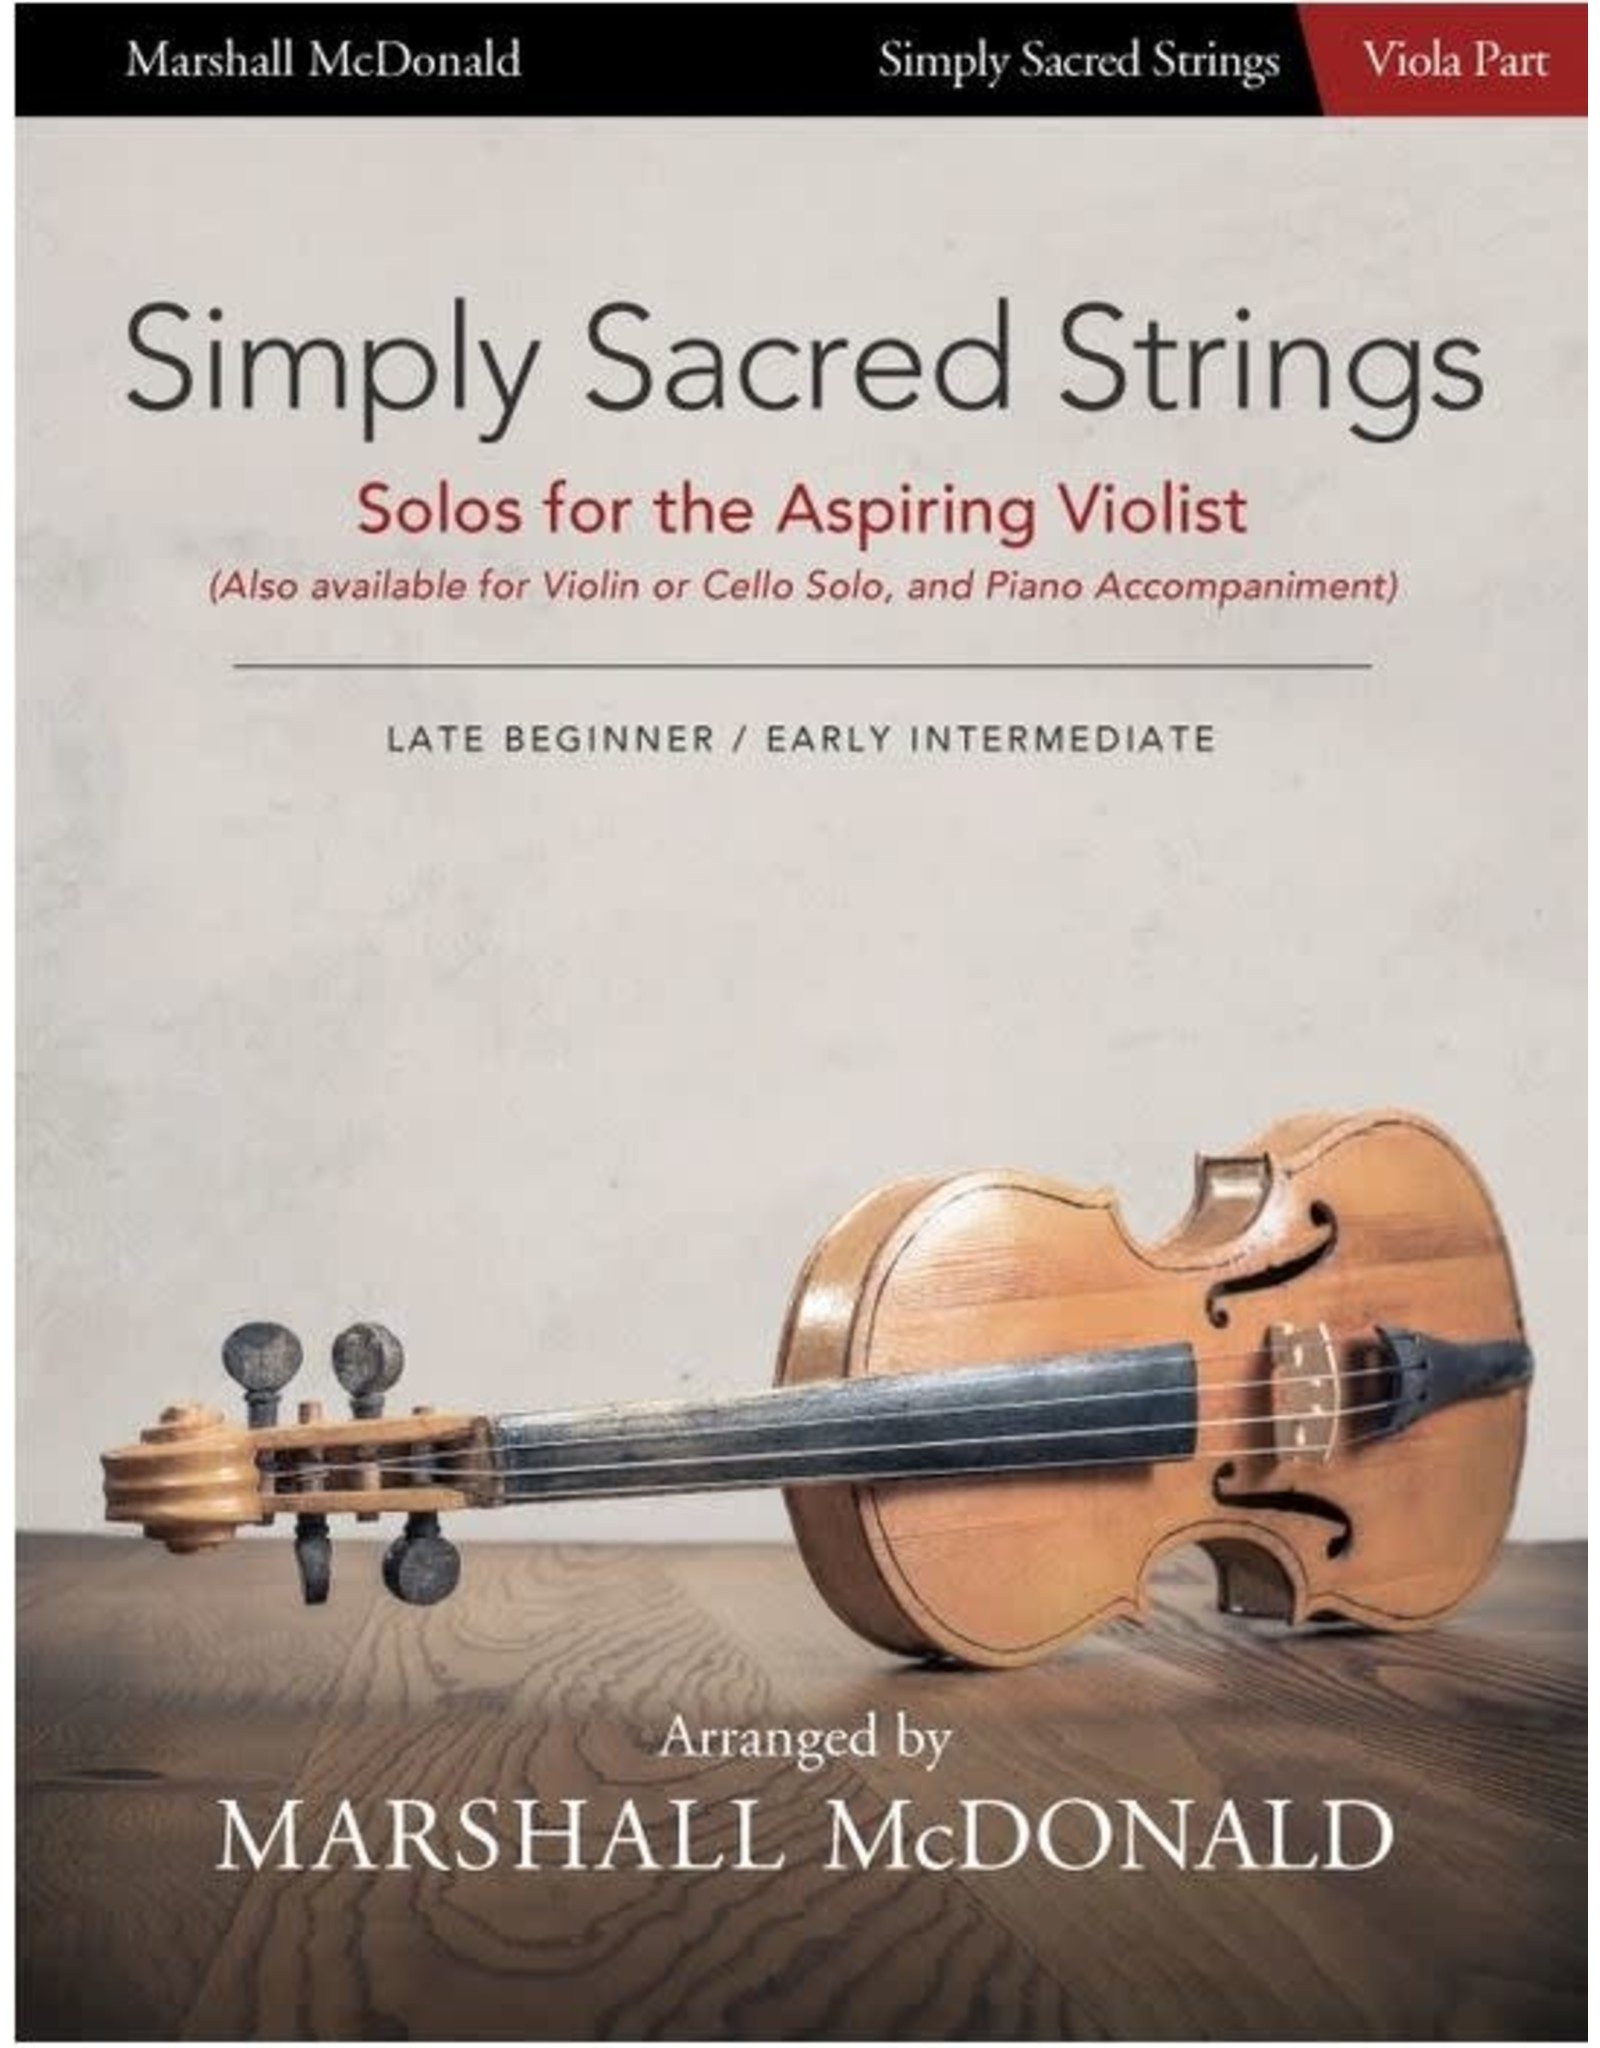 Marshall McDonald Music Simply Sacred Strings by Marshall McDonald - Viola Booklet